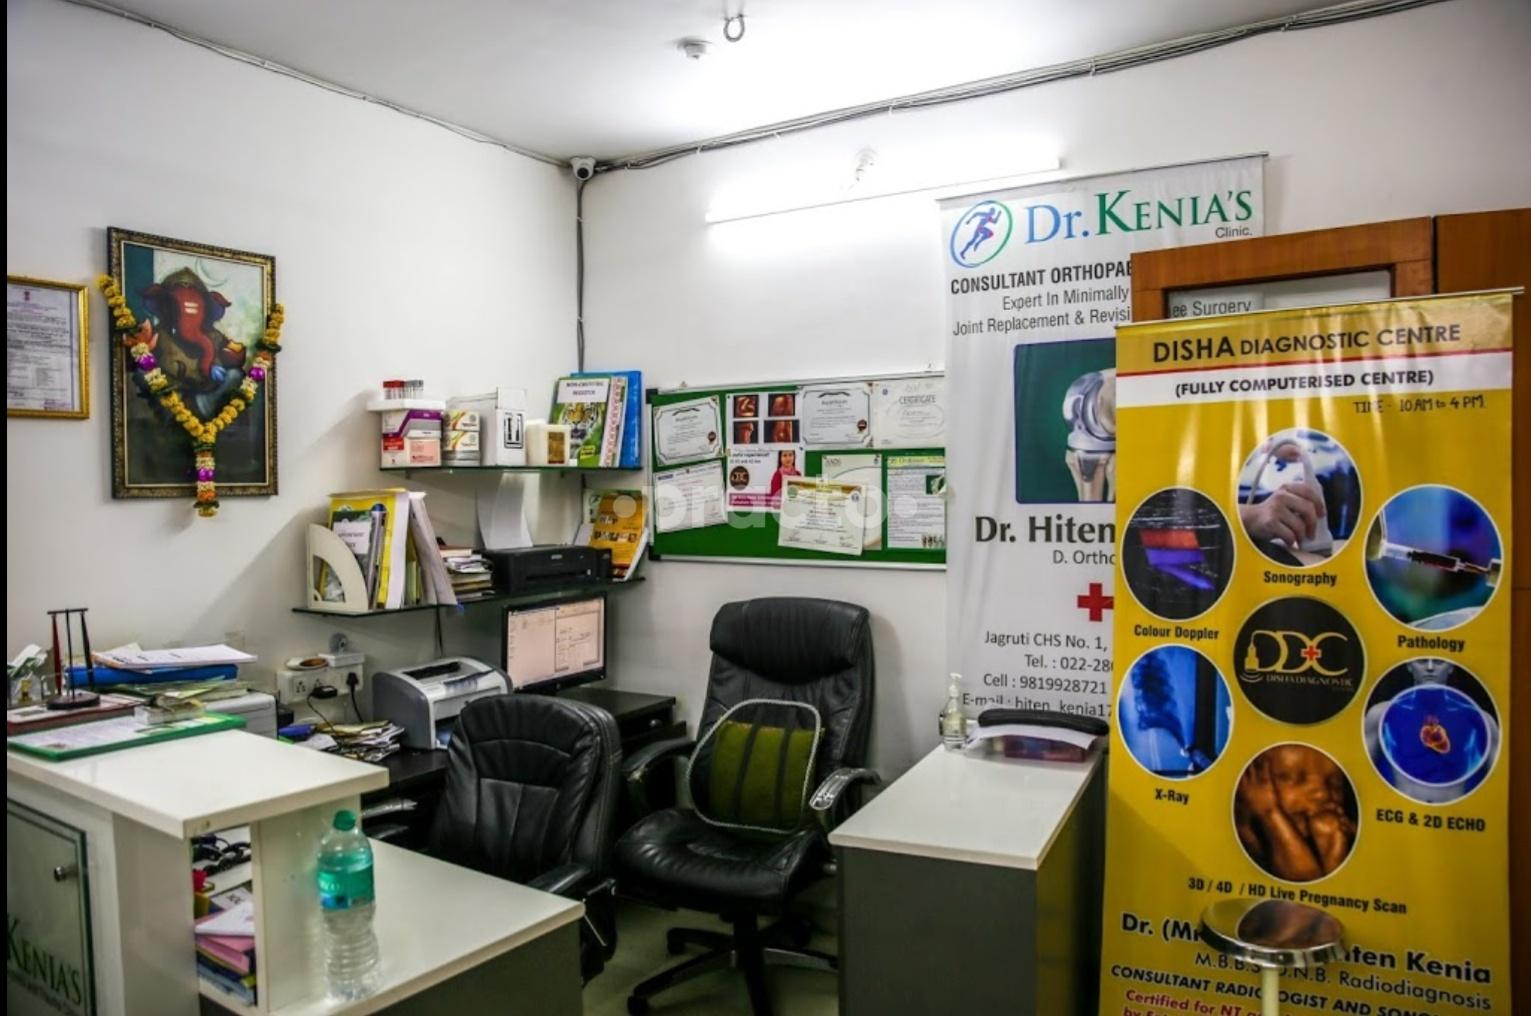 3d Exhibition In Borivali : Cancer pain management treating cancer pain in borivali west